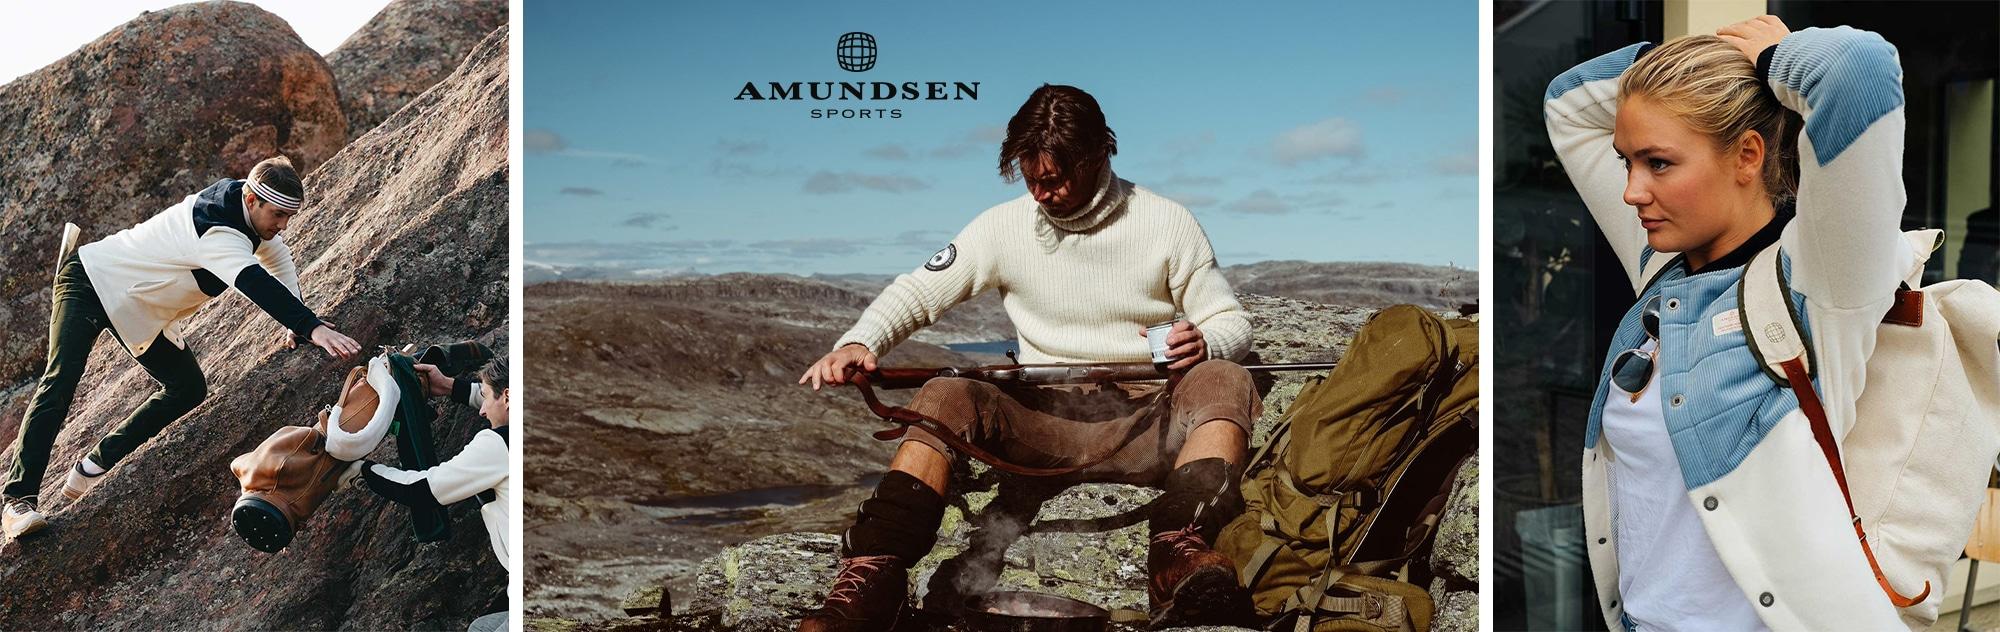 https://www.hektapatur.no/pub_docs/files/Custom_Item_Images/Hero---Amundsen-Sports-Oktober-2021.png